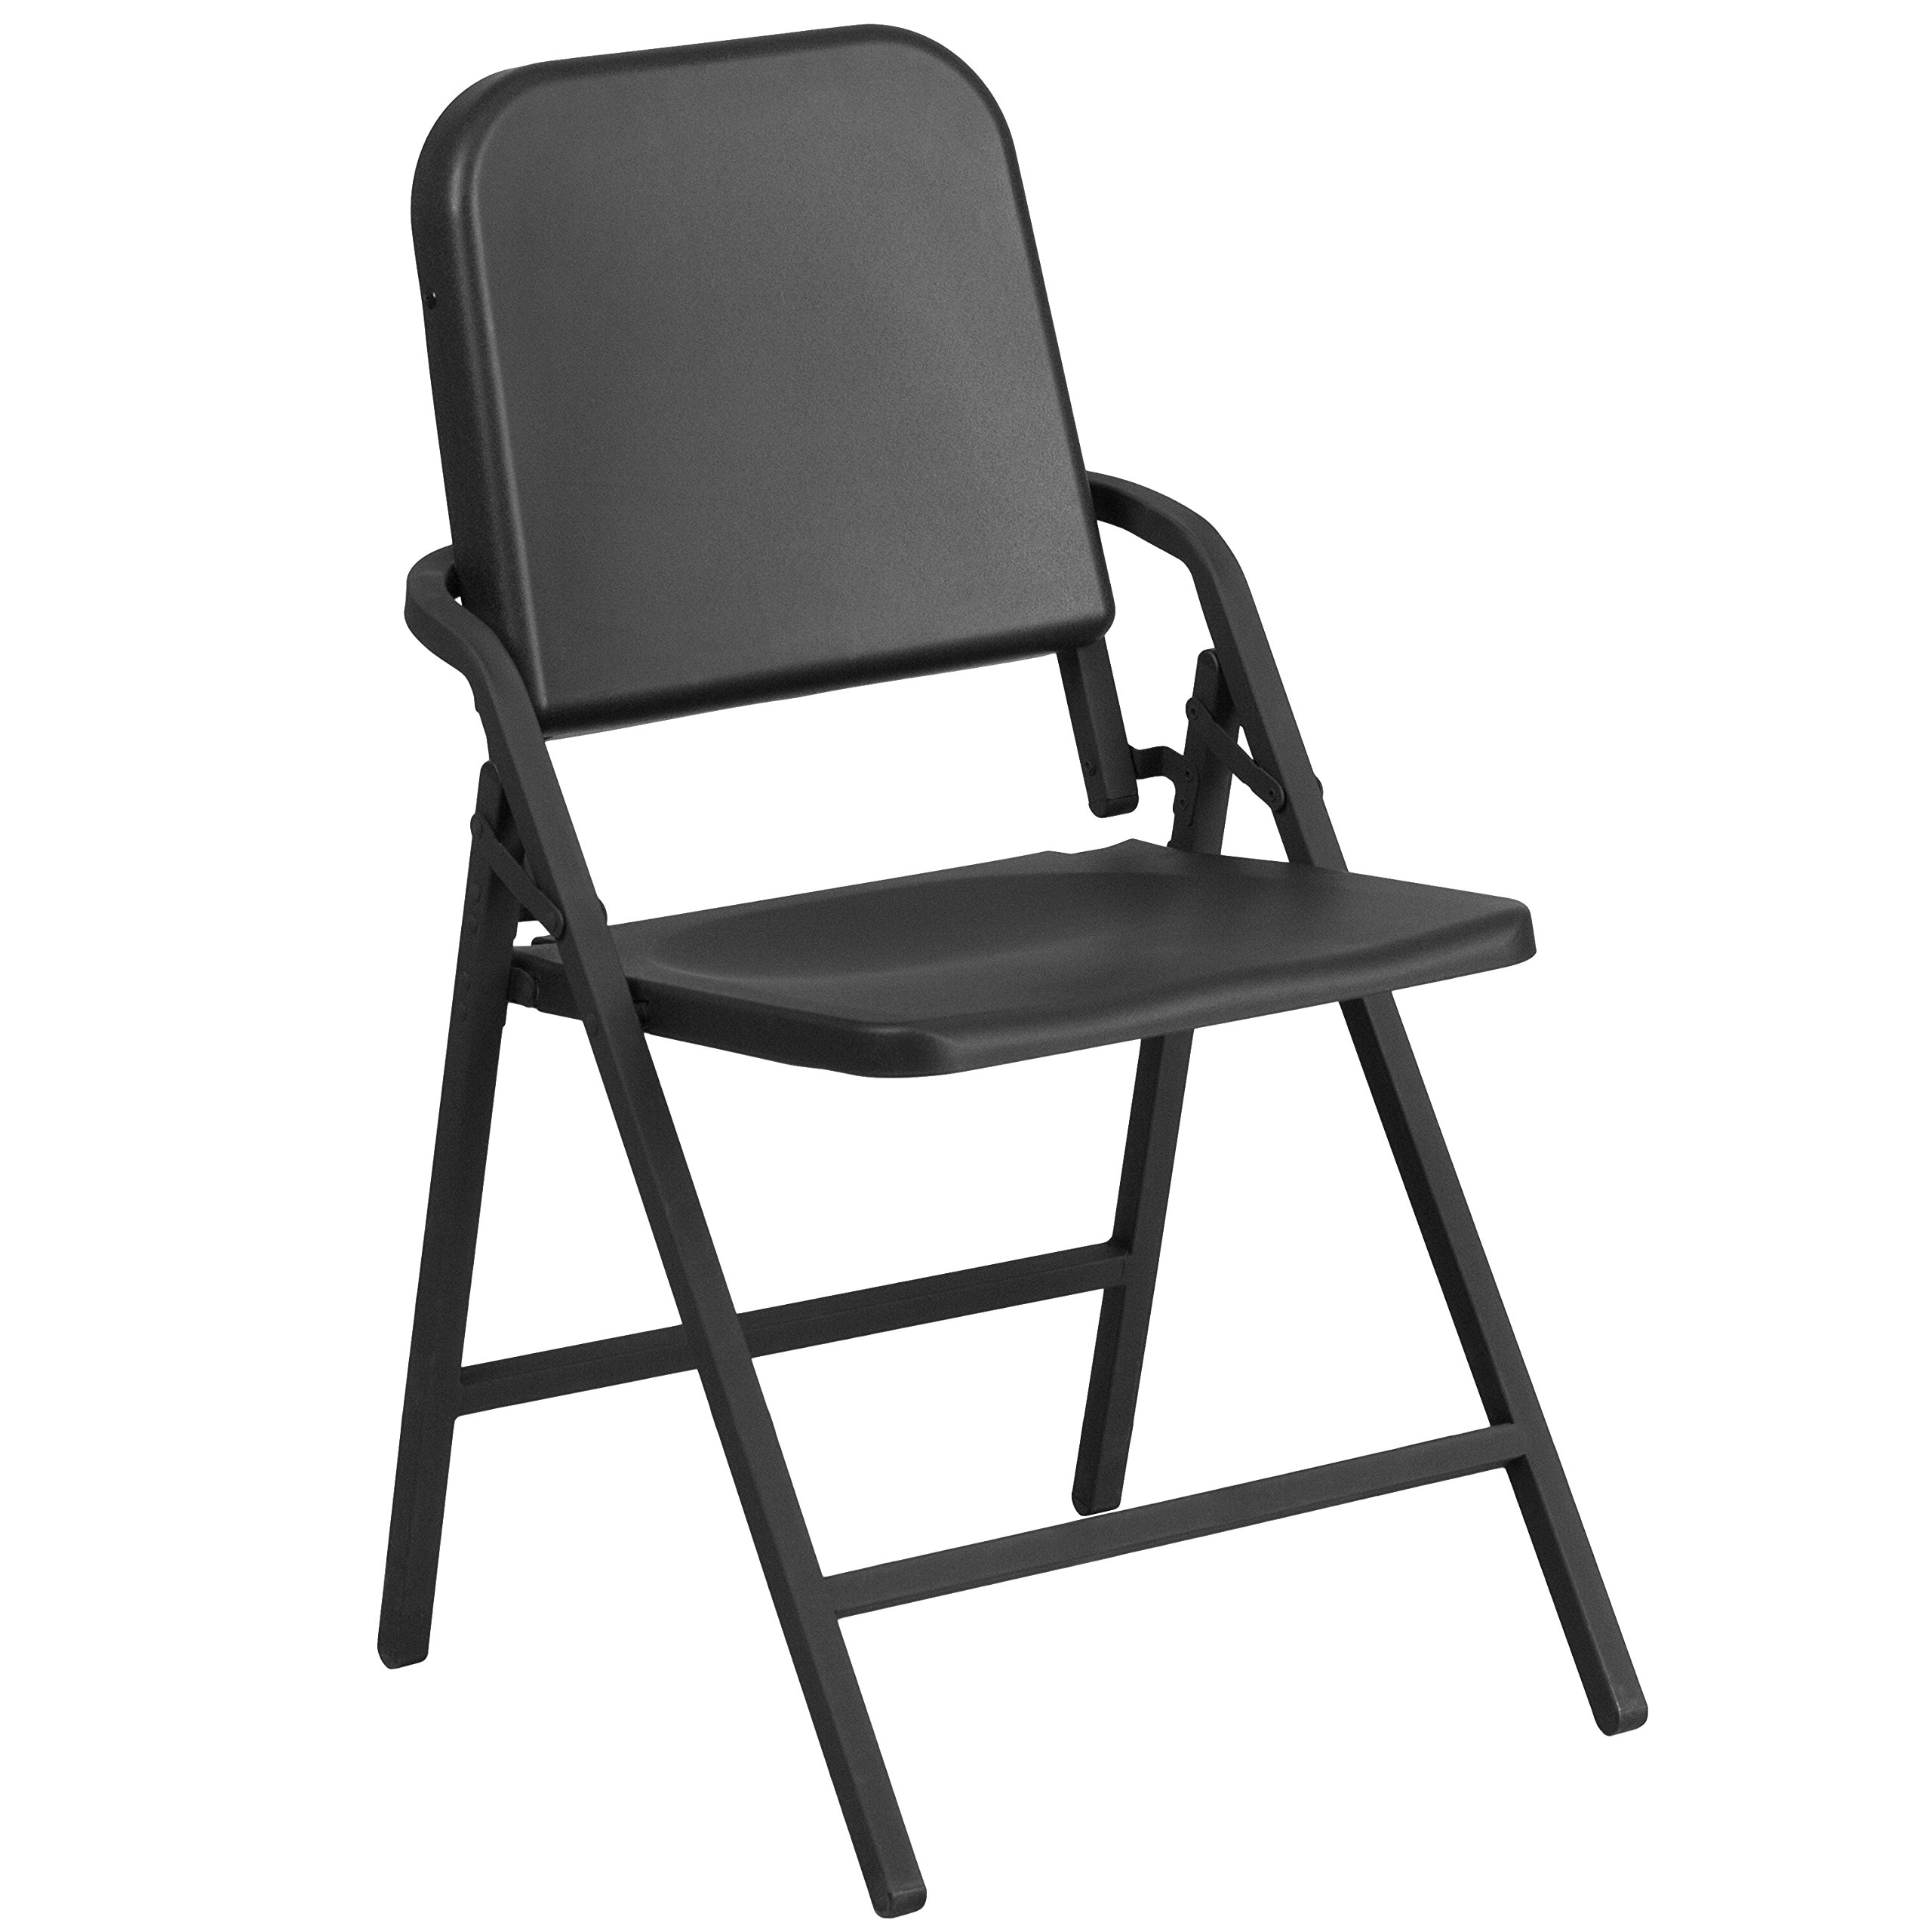 Flash Furniture HERCULES Series Black High Density Folding Melody Band/Music Chair